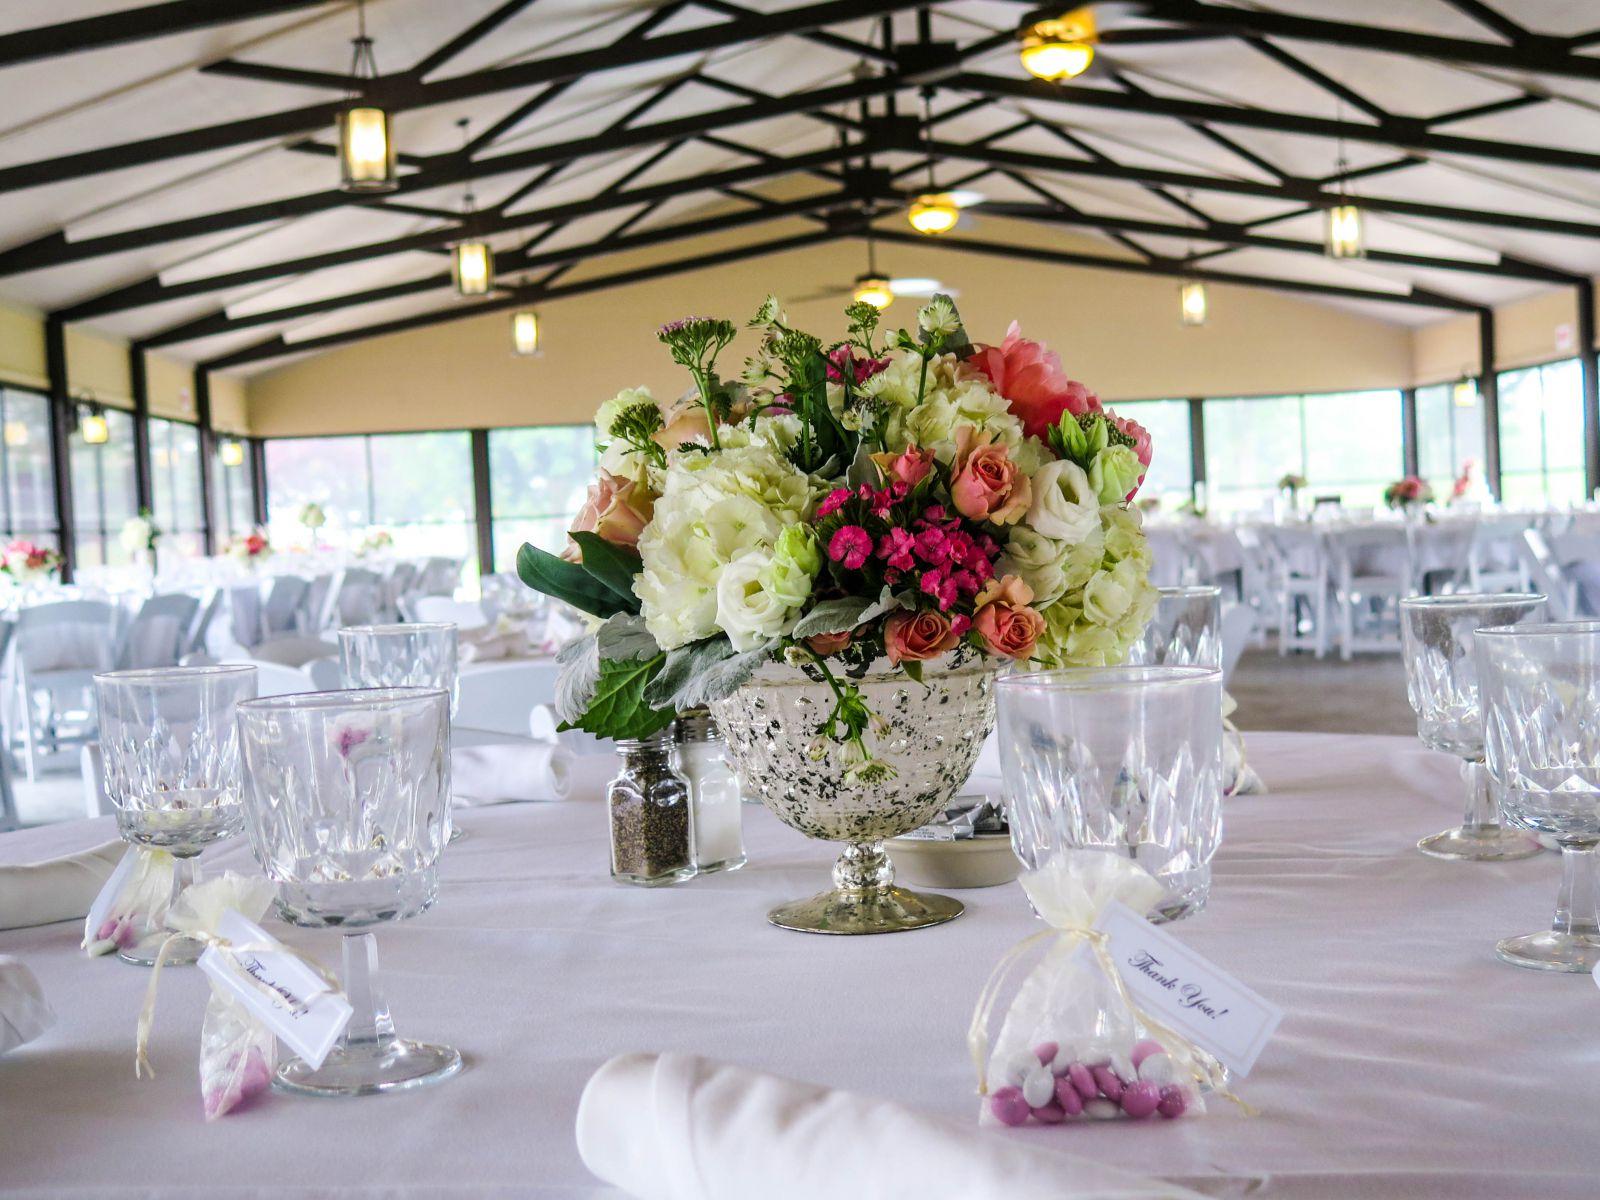 Wedding reception at Coachman's Golf Resort.